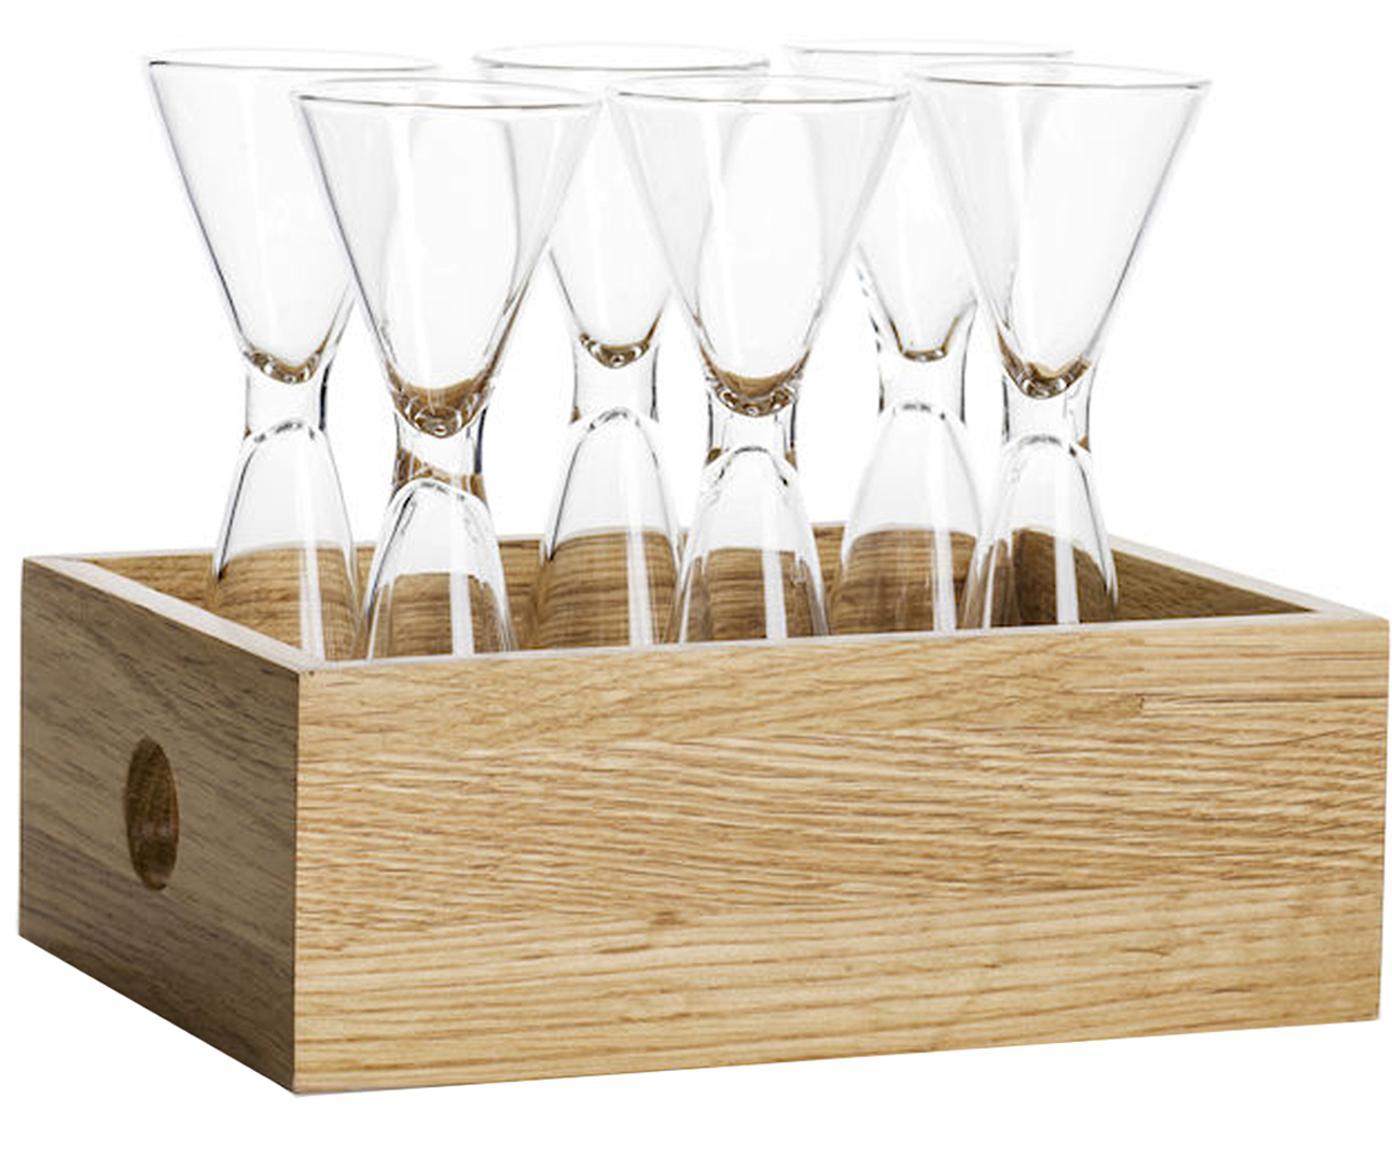 Set de vasos chupitos Semon, 7pzas., Vidrio soplado, madera de roble, Transparente, roble, Ø 4 x Al 12 cm